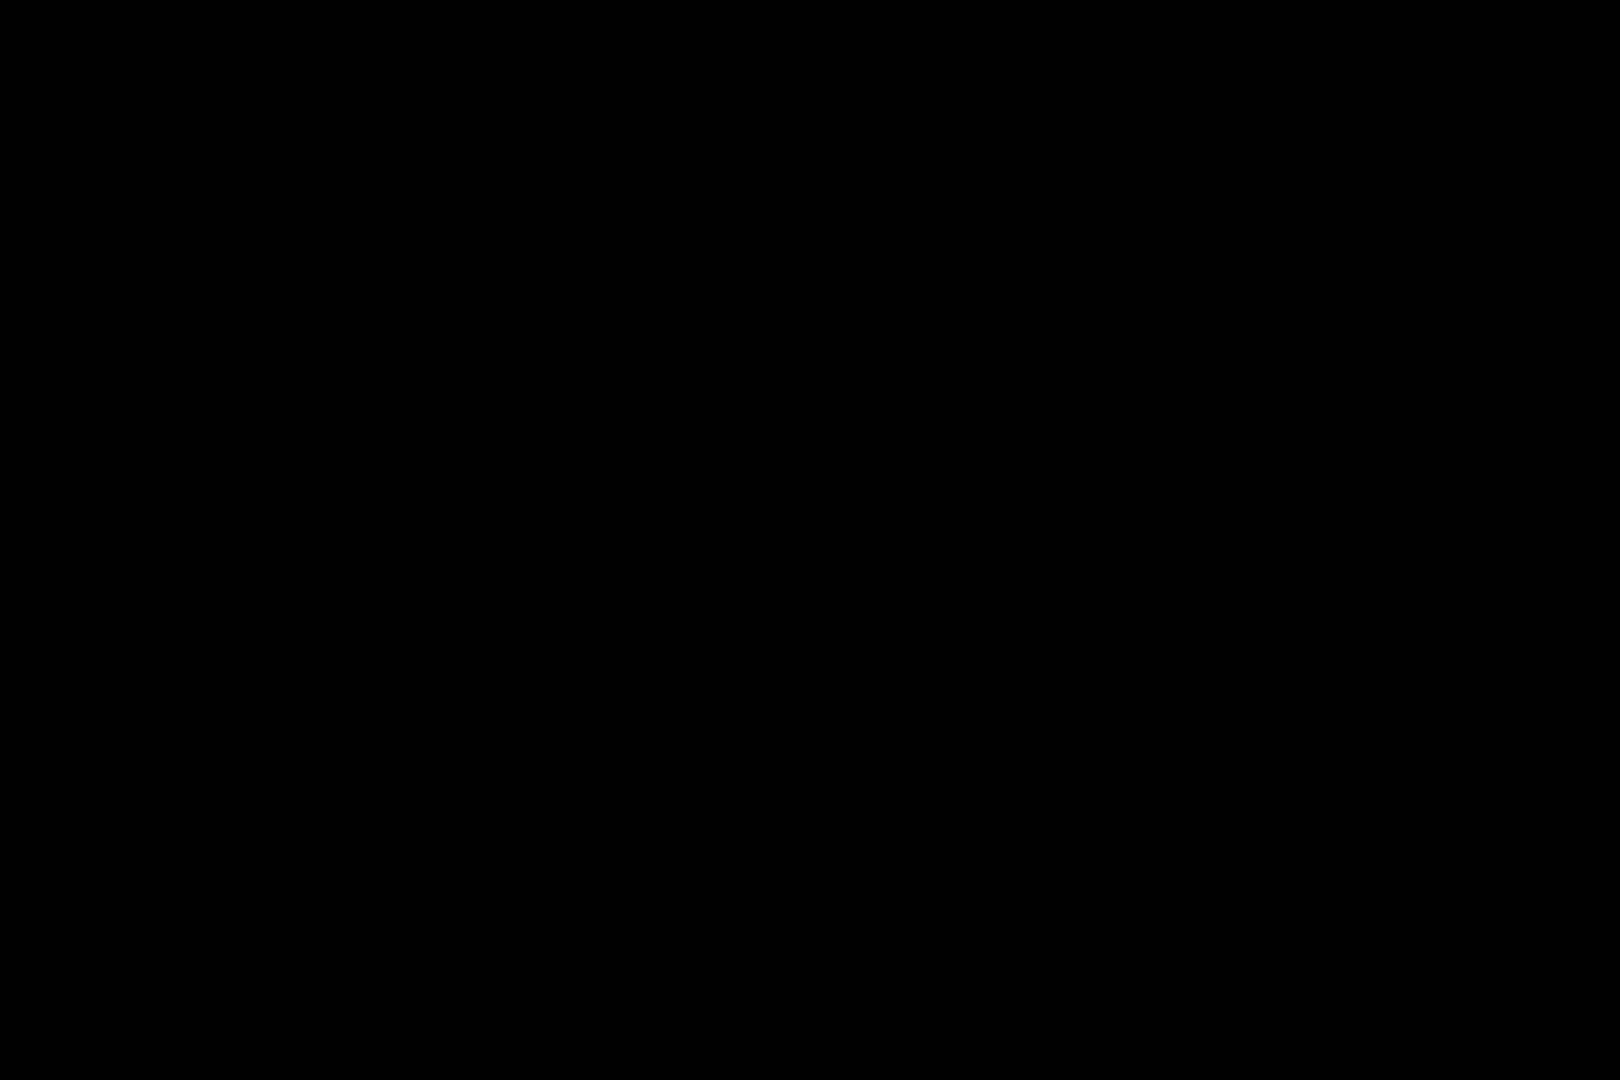 H大好き!全身性感帯四十路人妻~山本ちあき~ オナニー集 のぞき動画キャプチャ 90pic 8